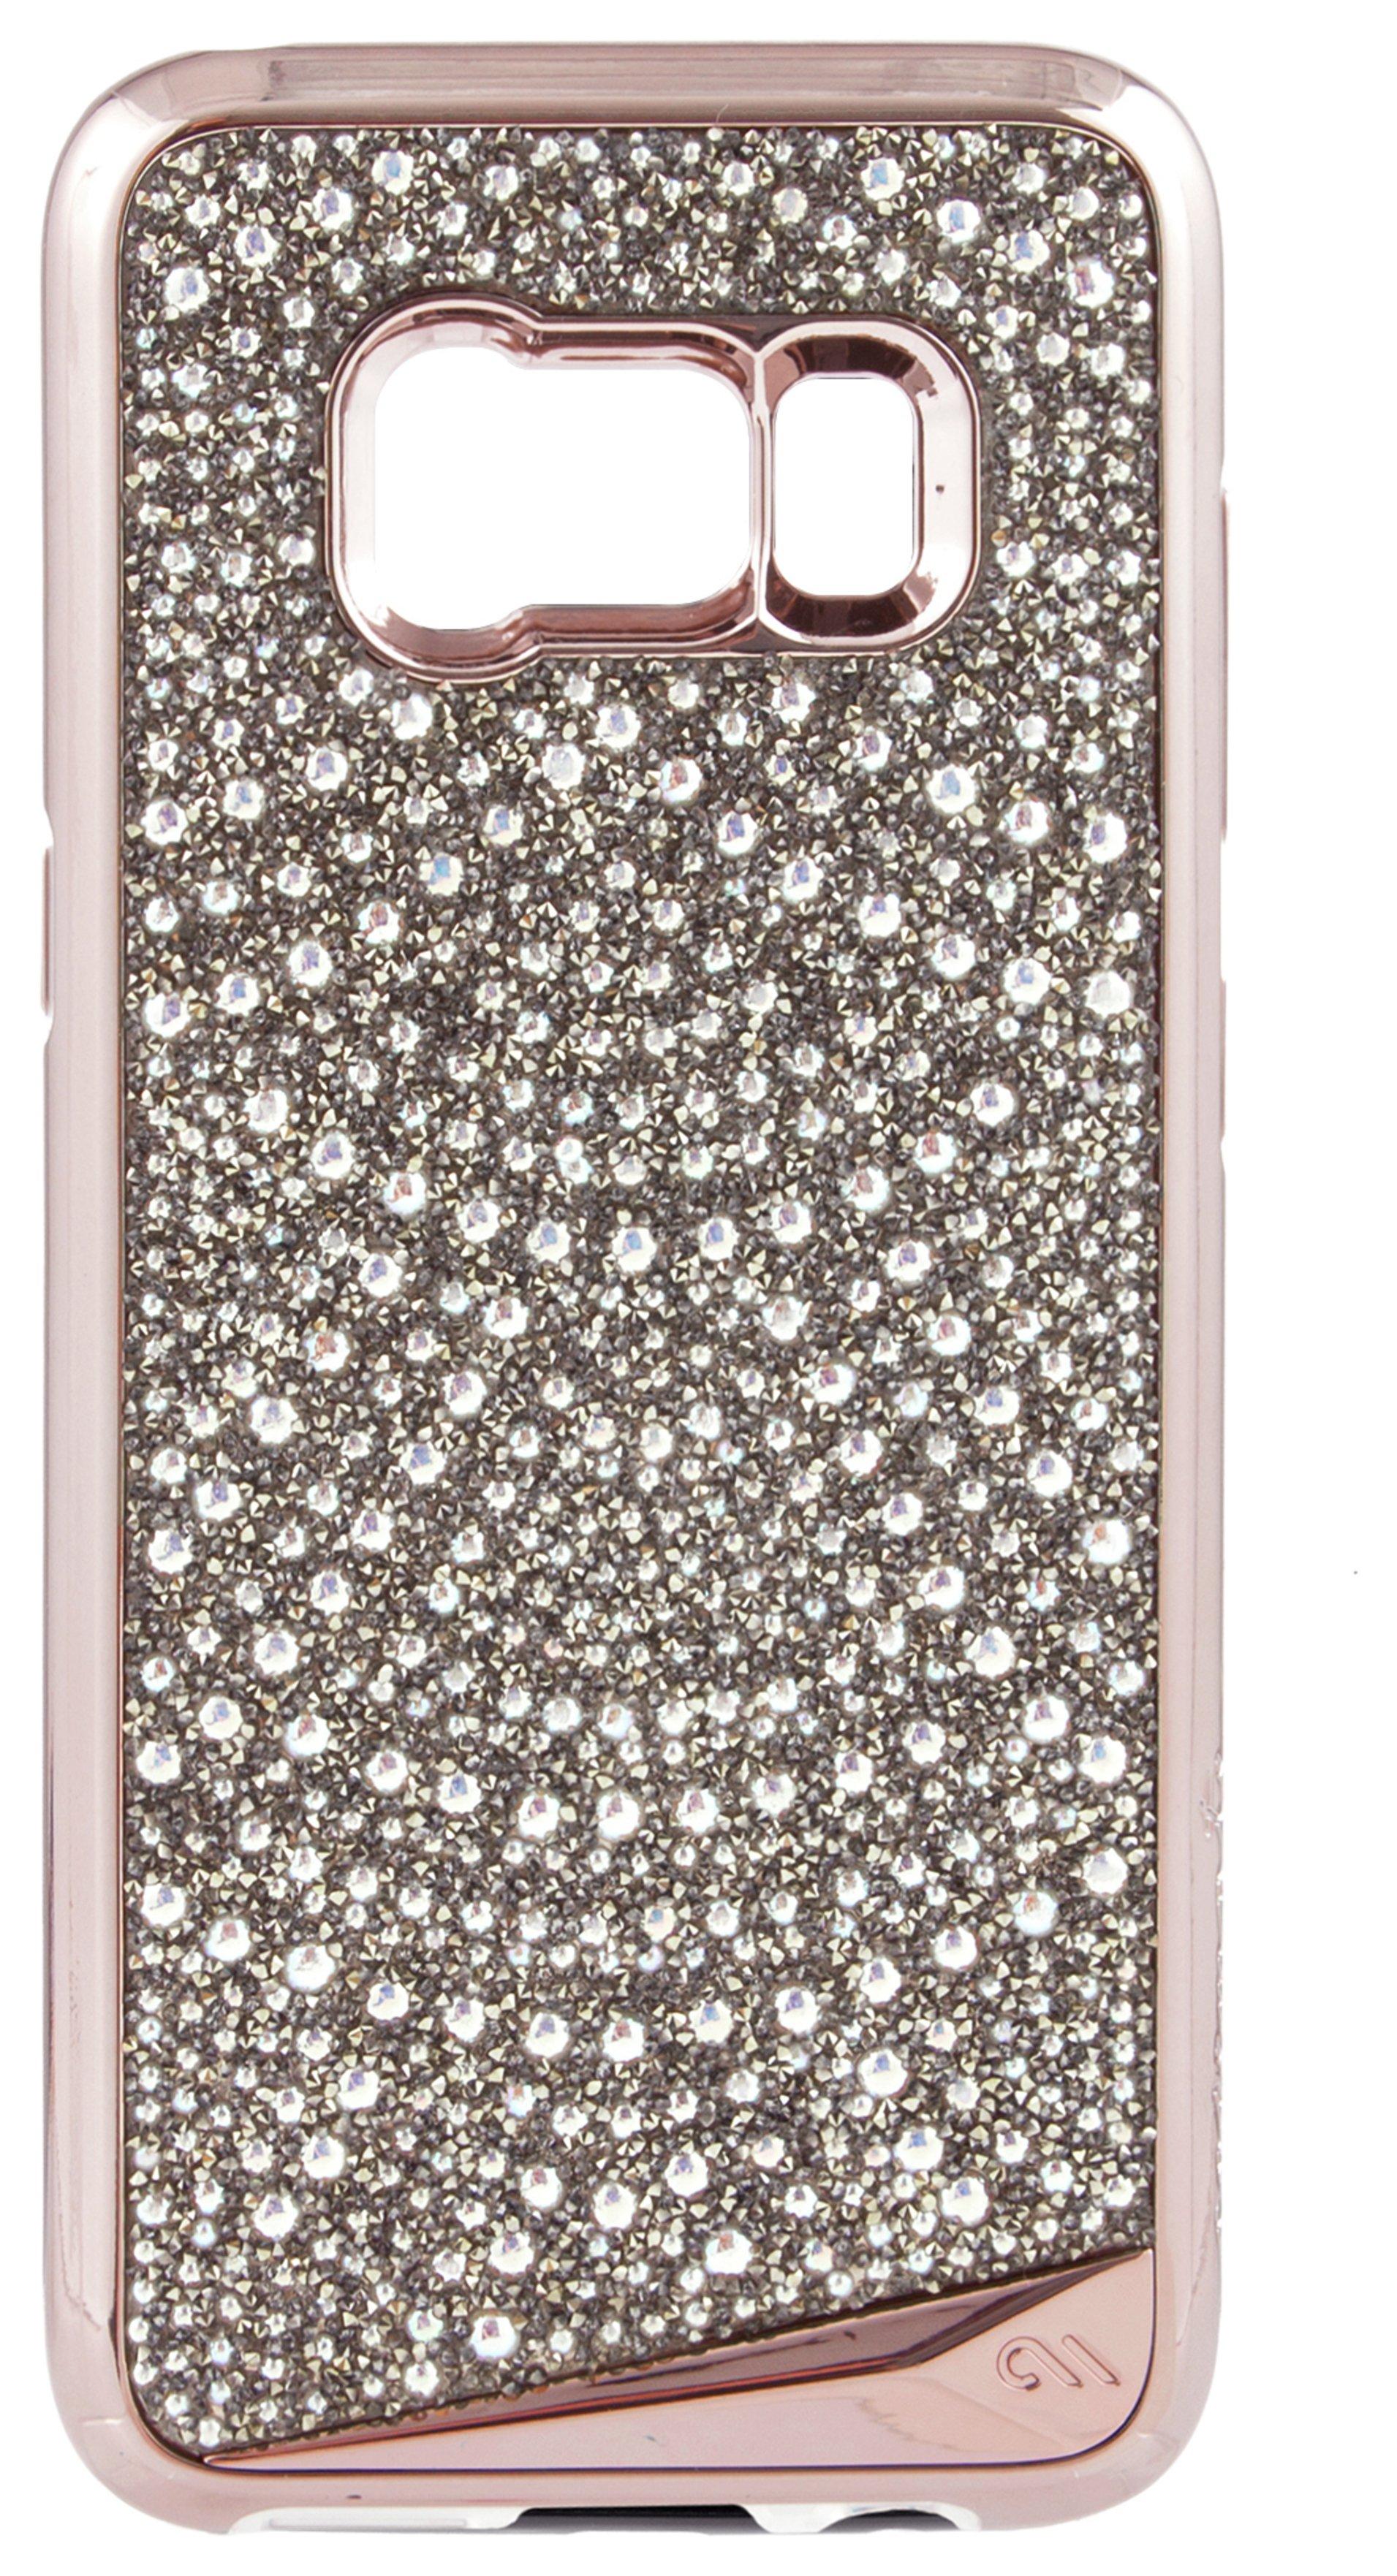 Image of Case-Mate Brilliance Tough Samsung S8 Case - Lace